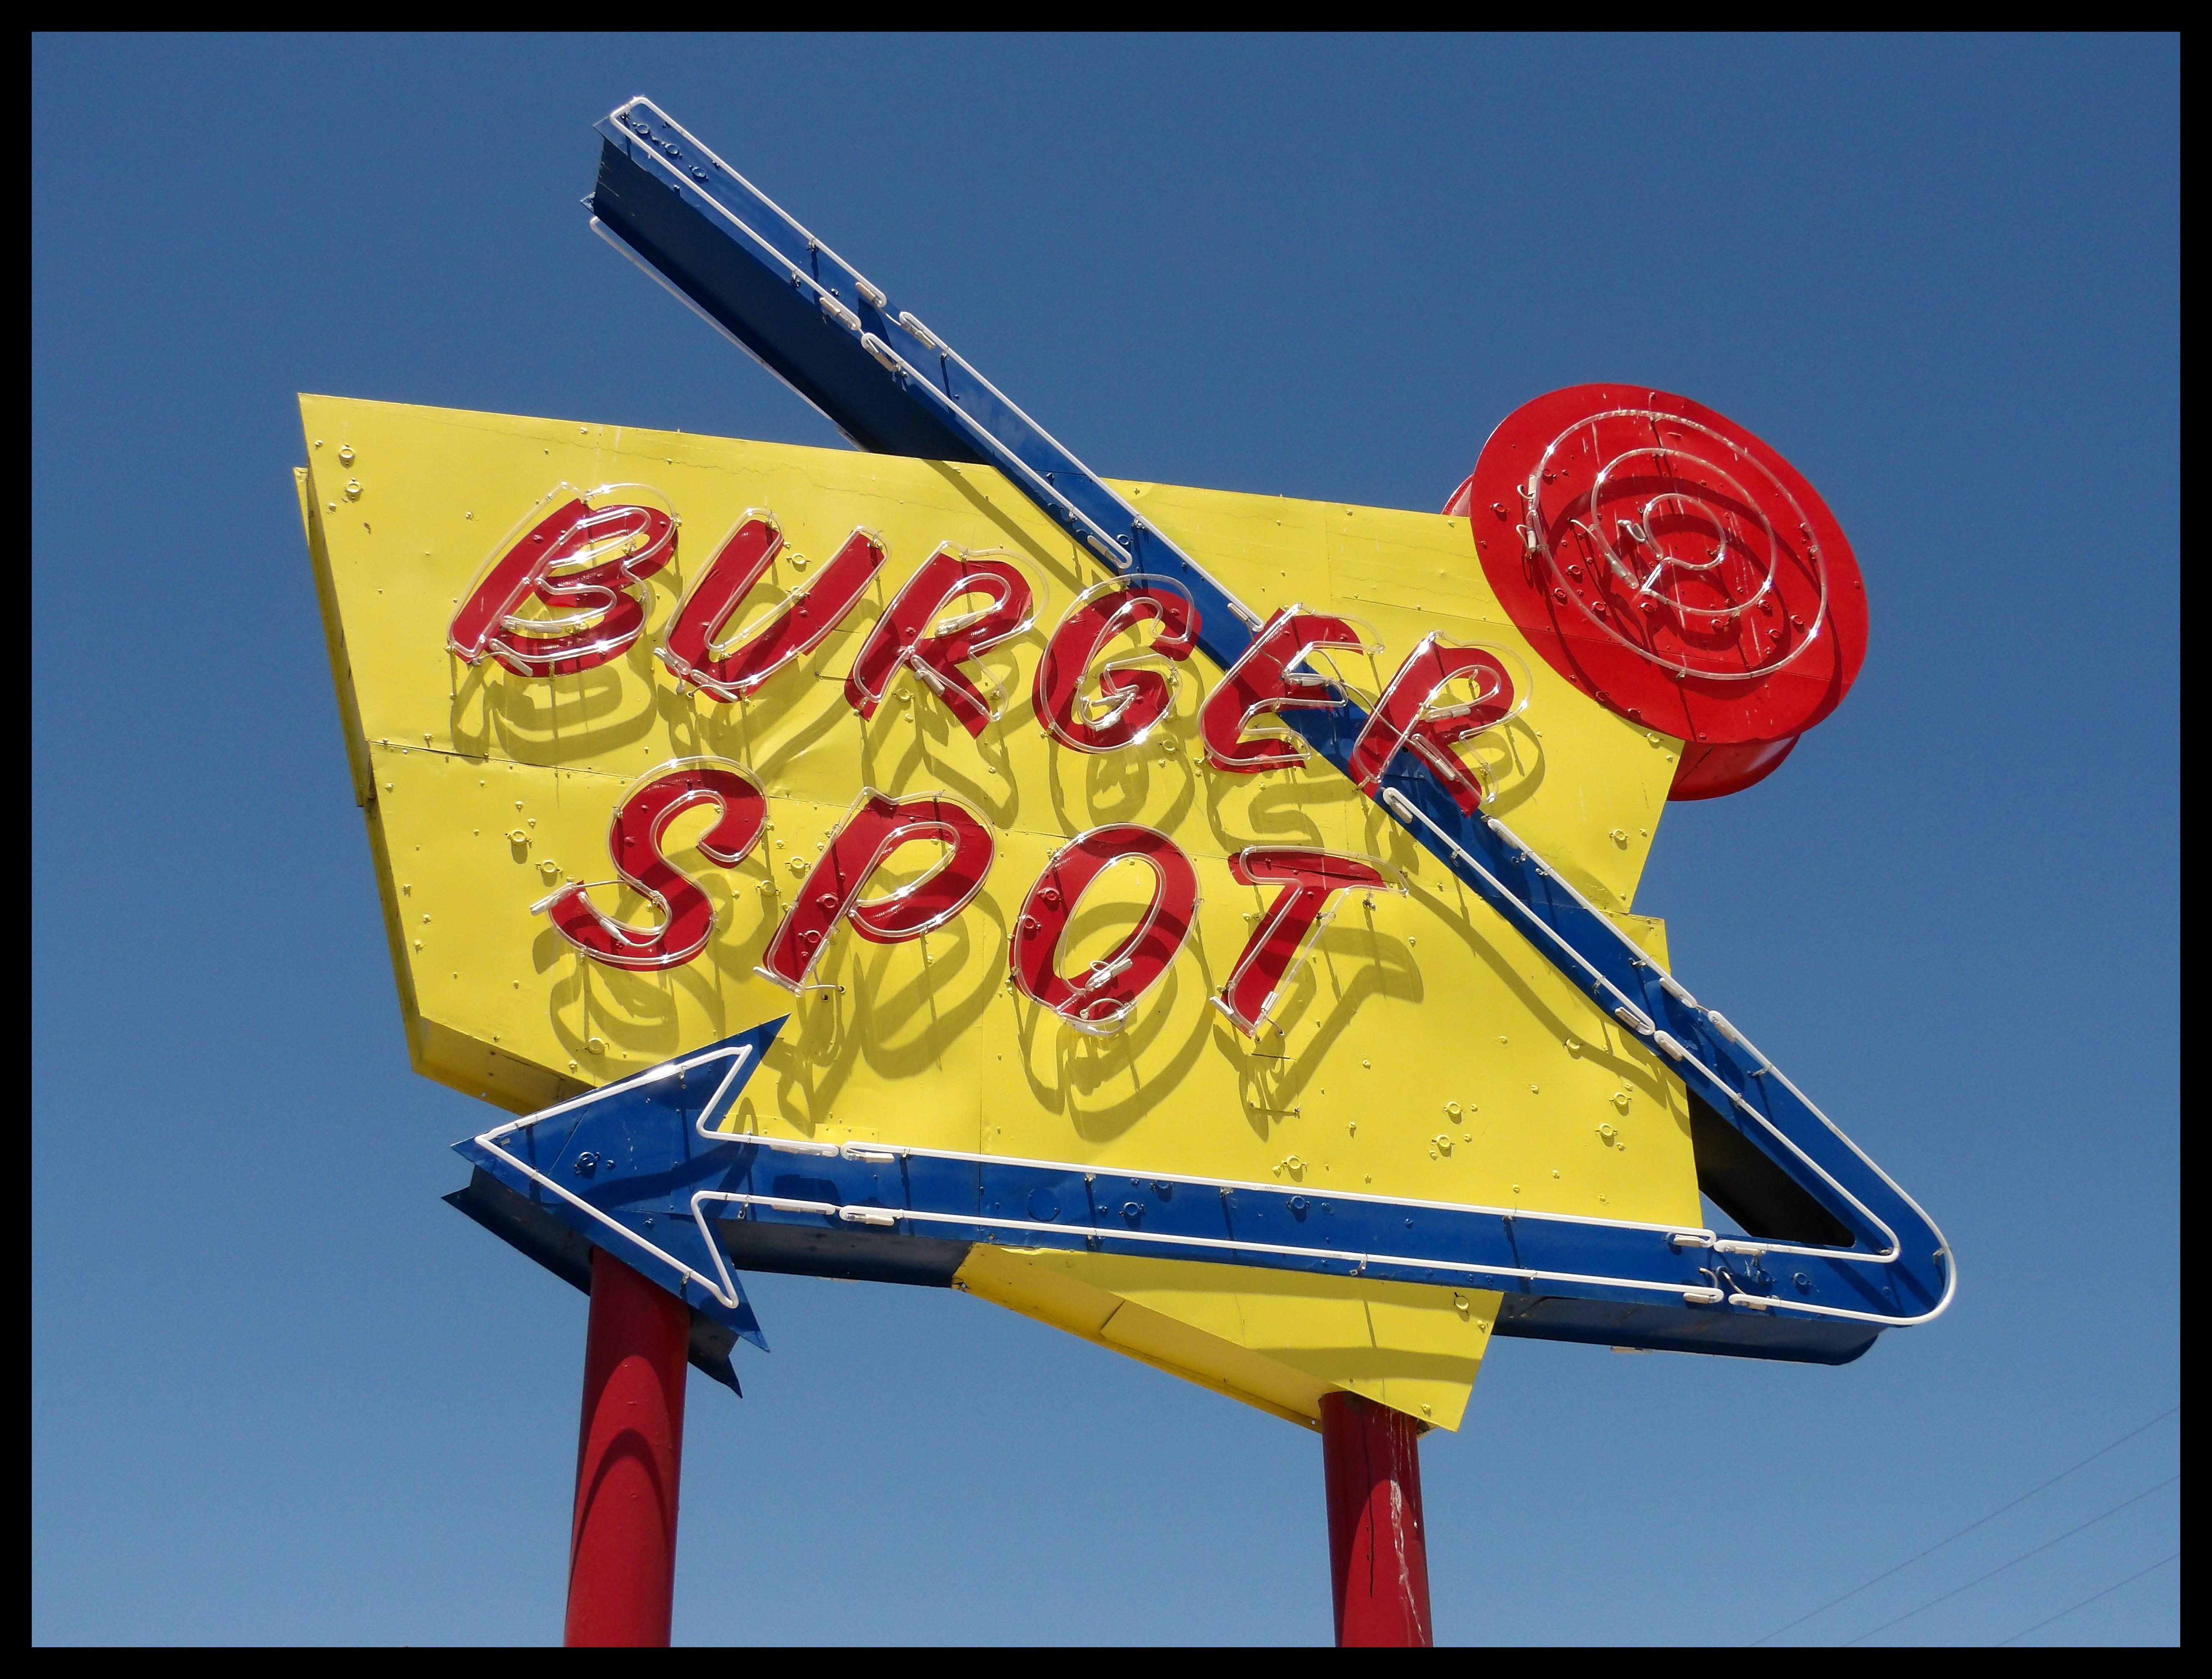 Burger Spot - 208 West Tehachapi Boulevard, Tehachapi, California U.S.A. - June 30, 2018